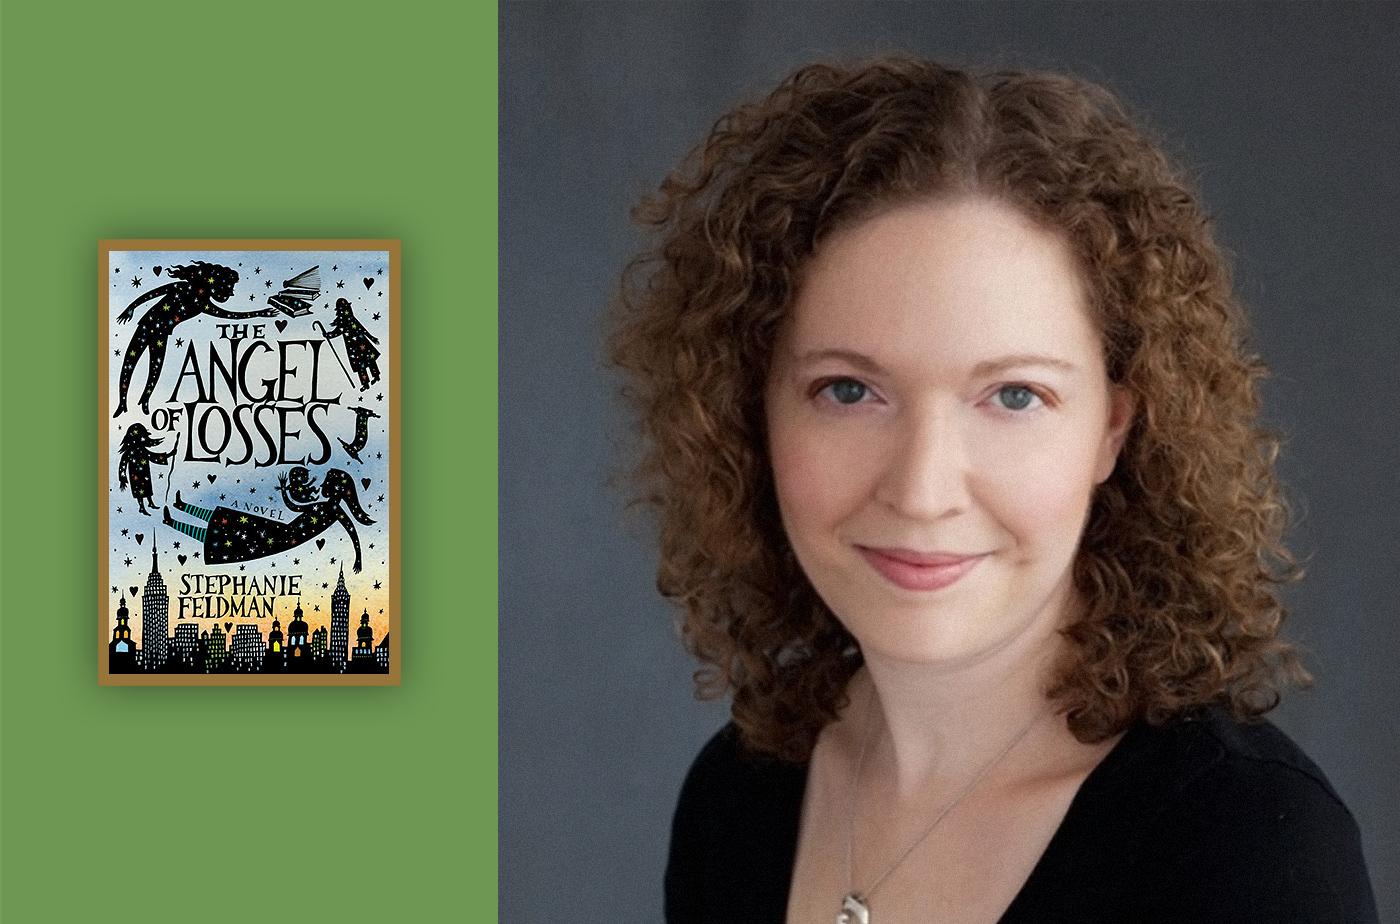 Catapult online classes: Stephanie Feldman, 4-Week Online Fiction Seminar: Solve Your Novel's Structure, Novel, Fiction, Seminar